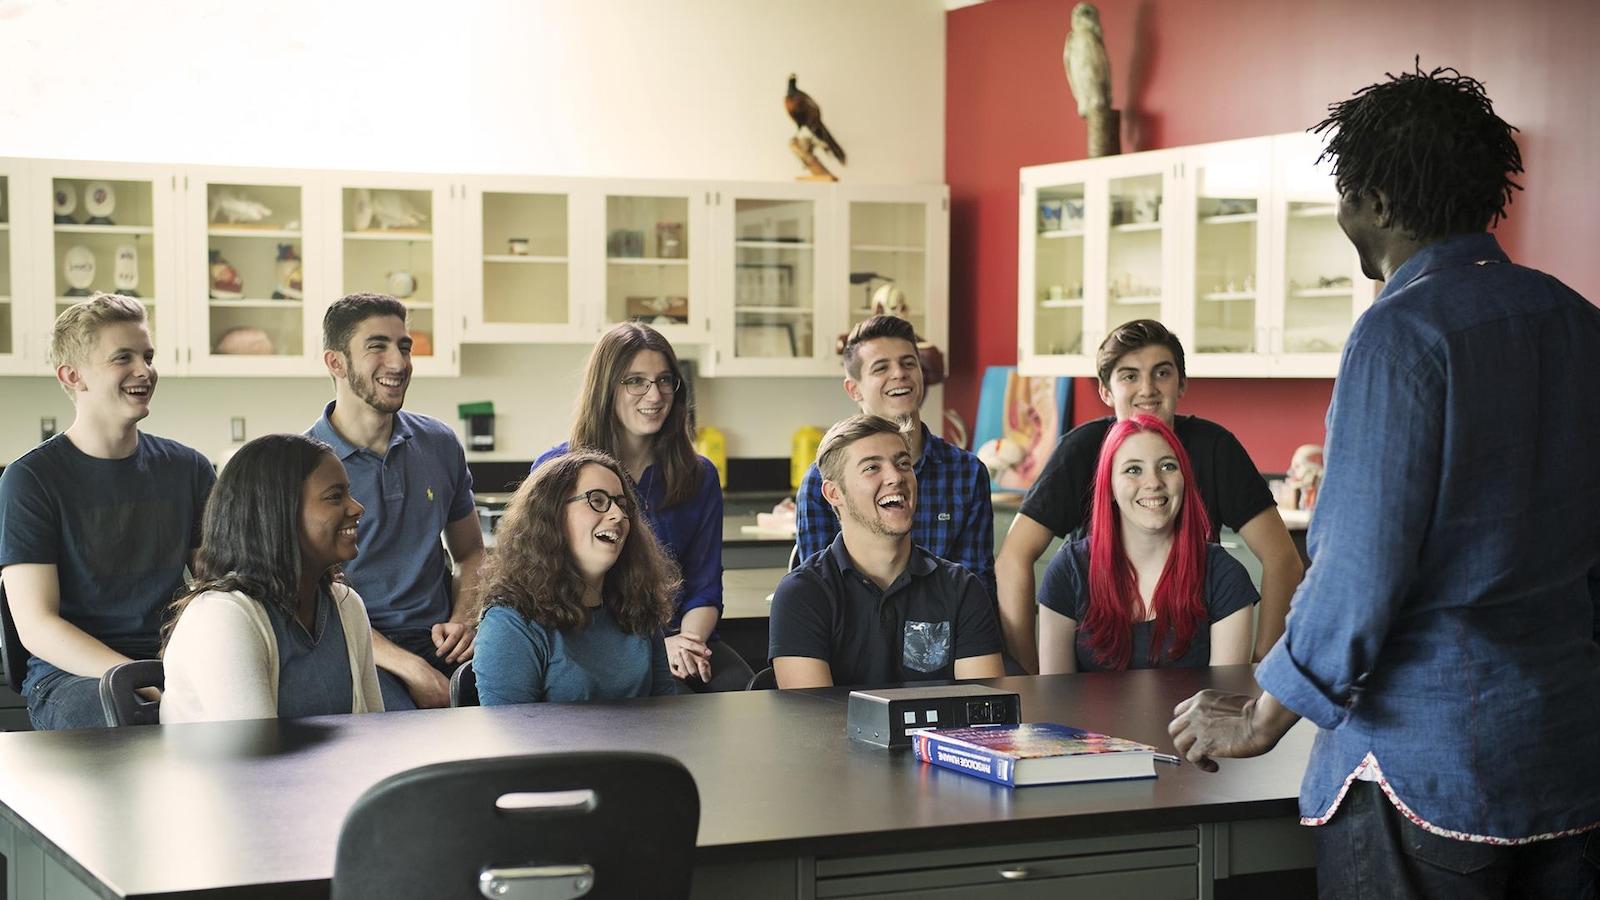 Boucar Diouf anime devant une classe de jeunes.